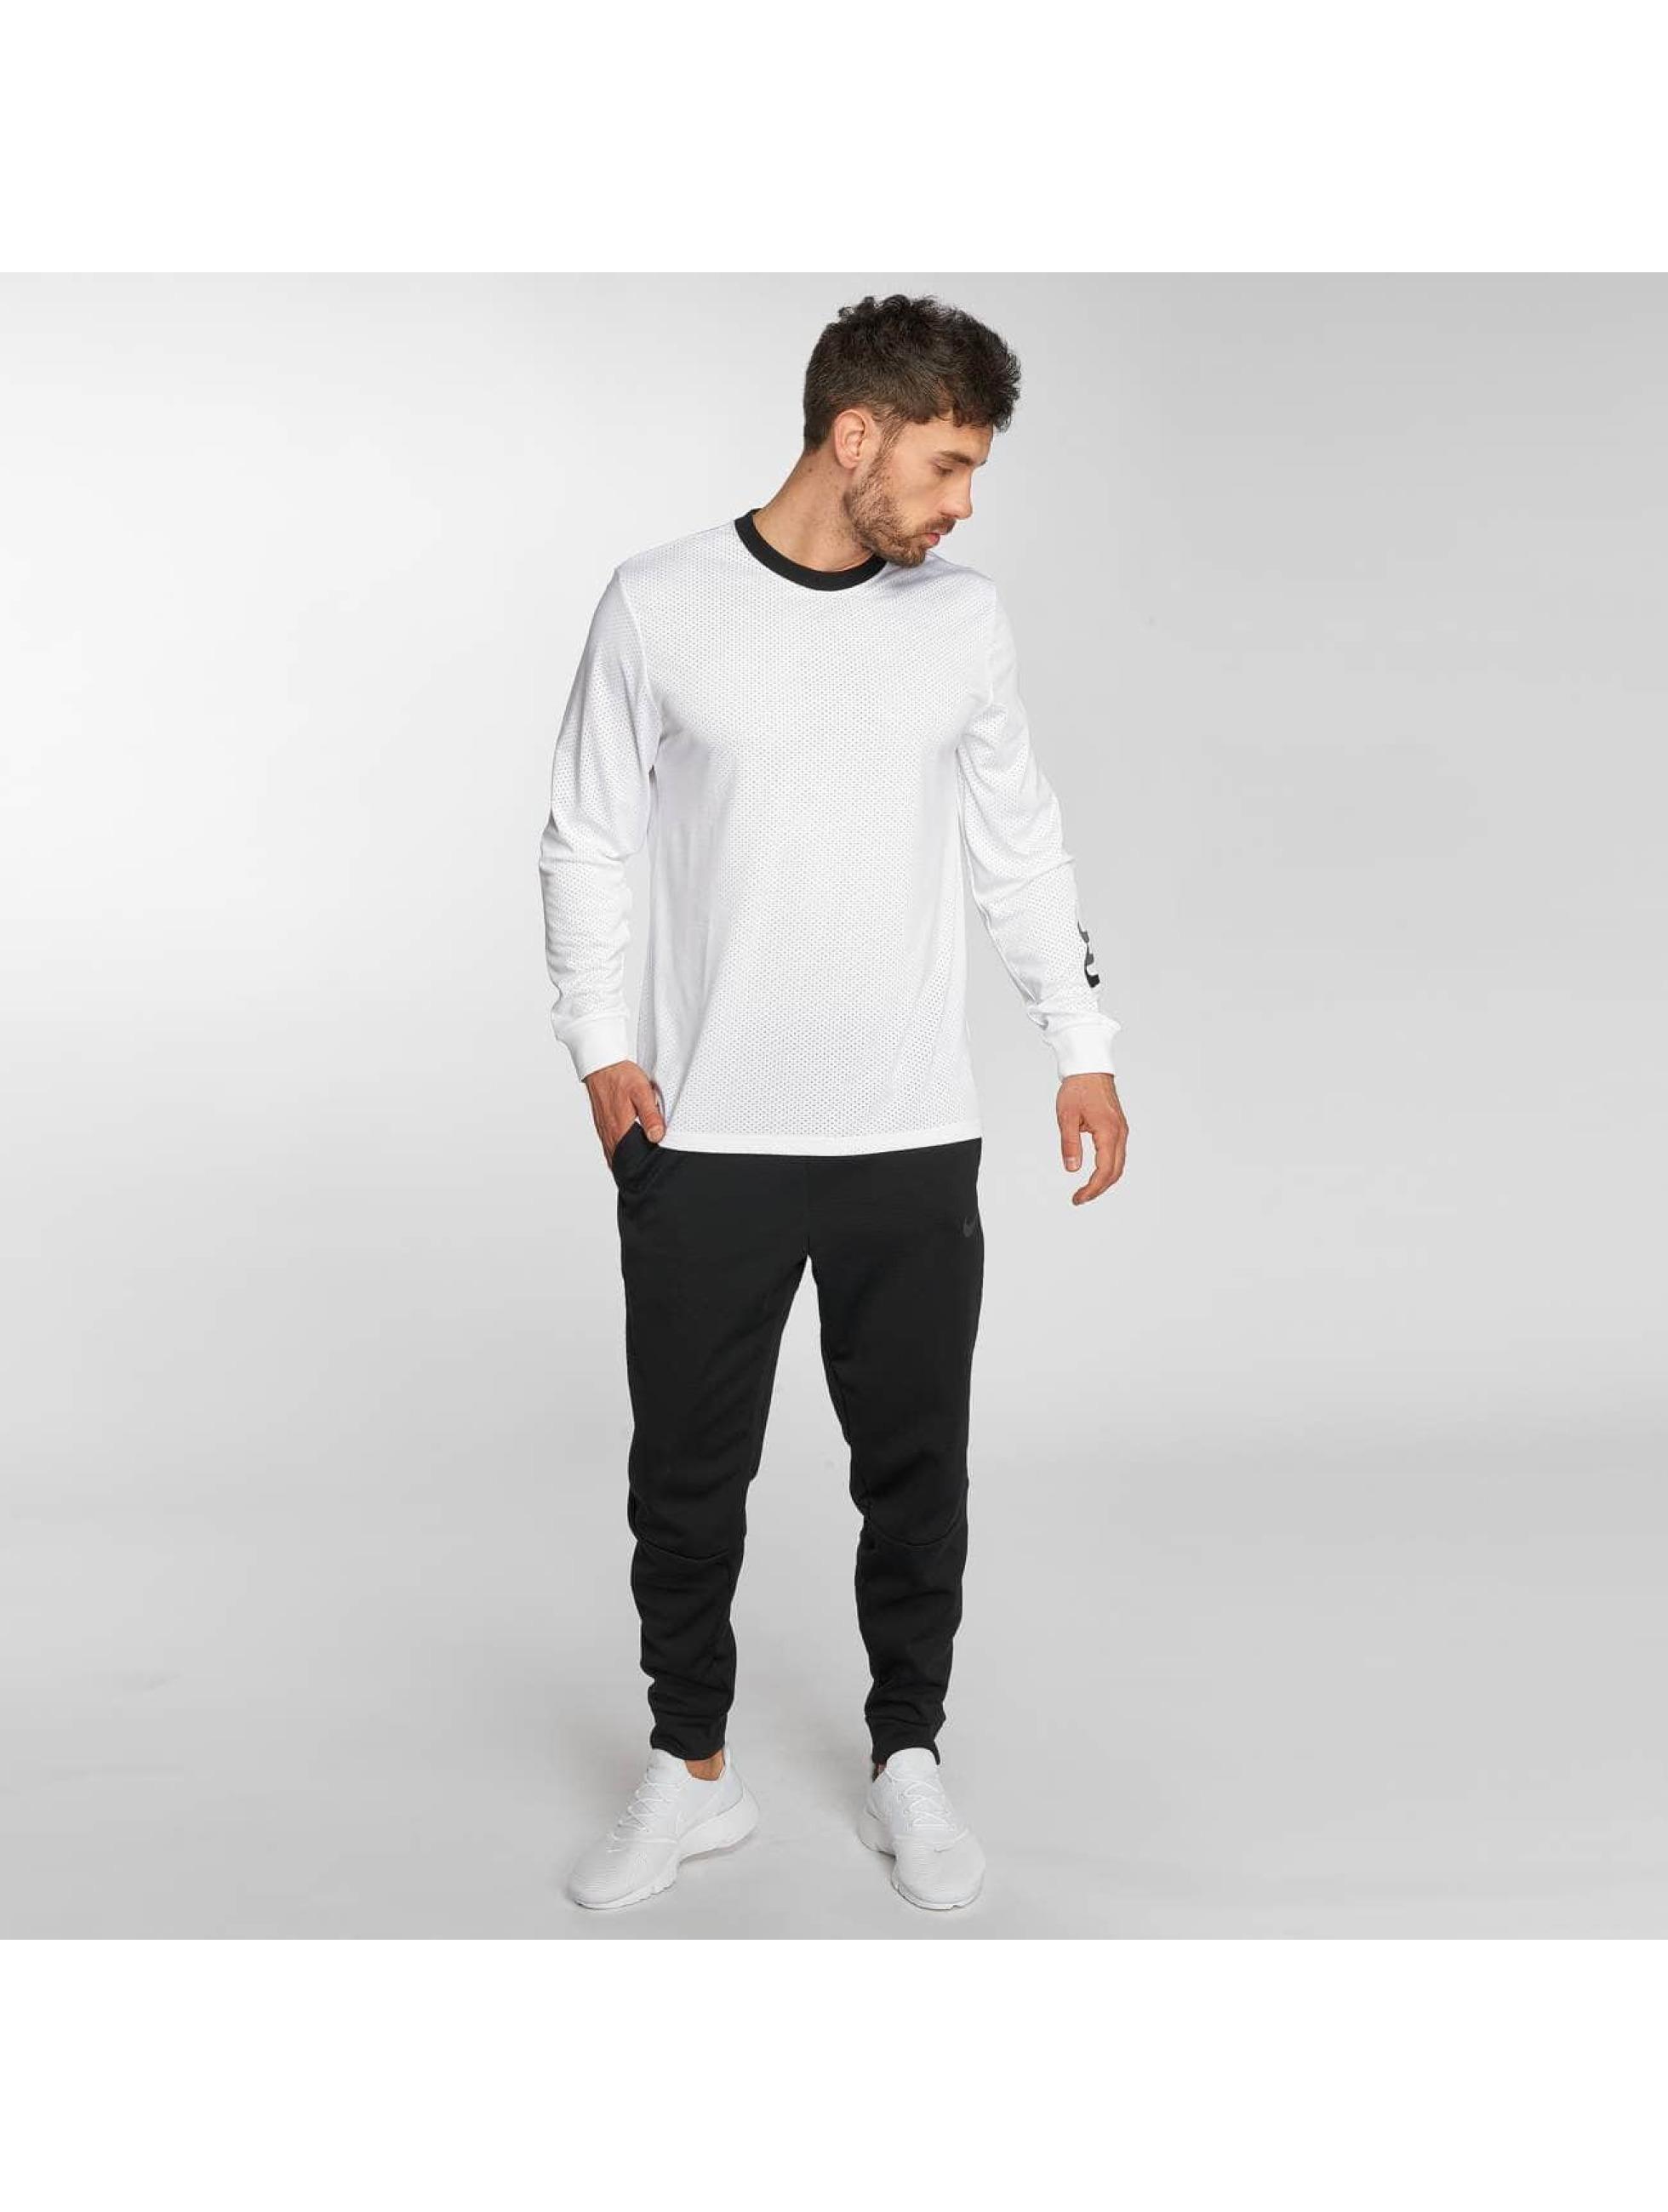 Nike Performance Spodnie do joggingu Therma Sphere czarny